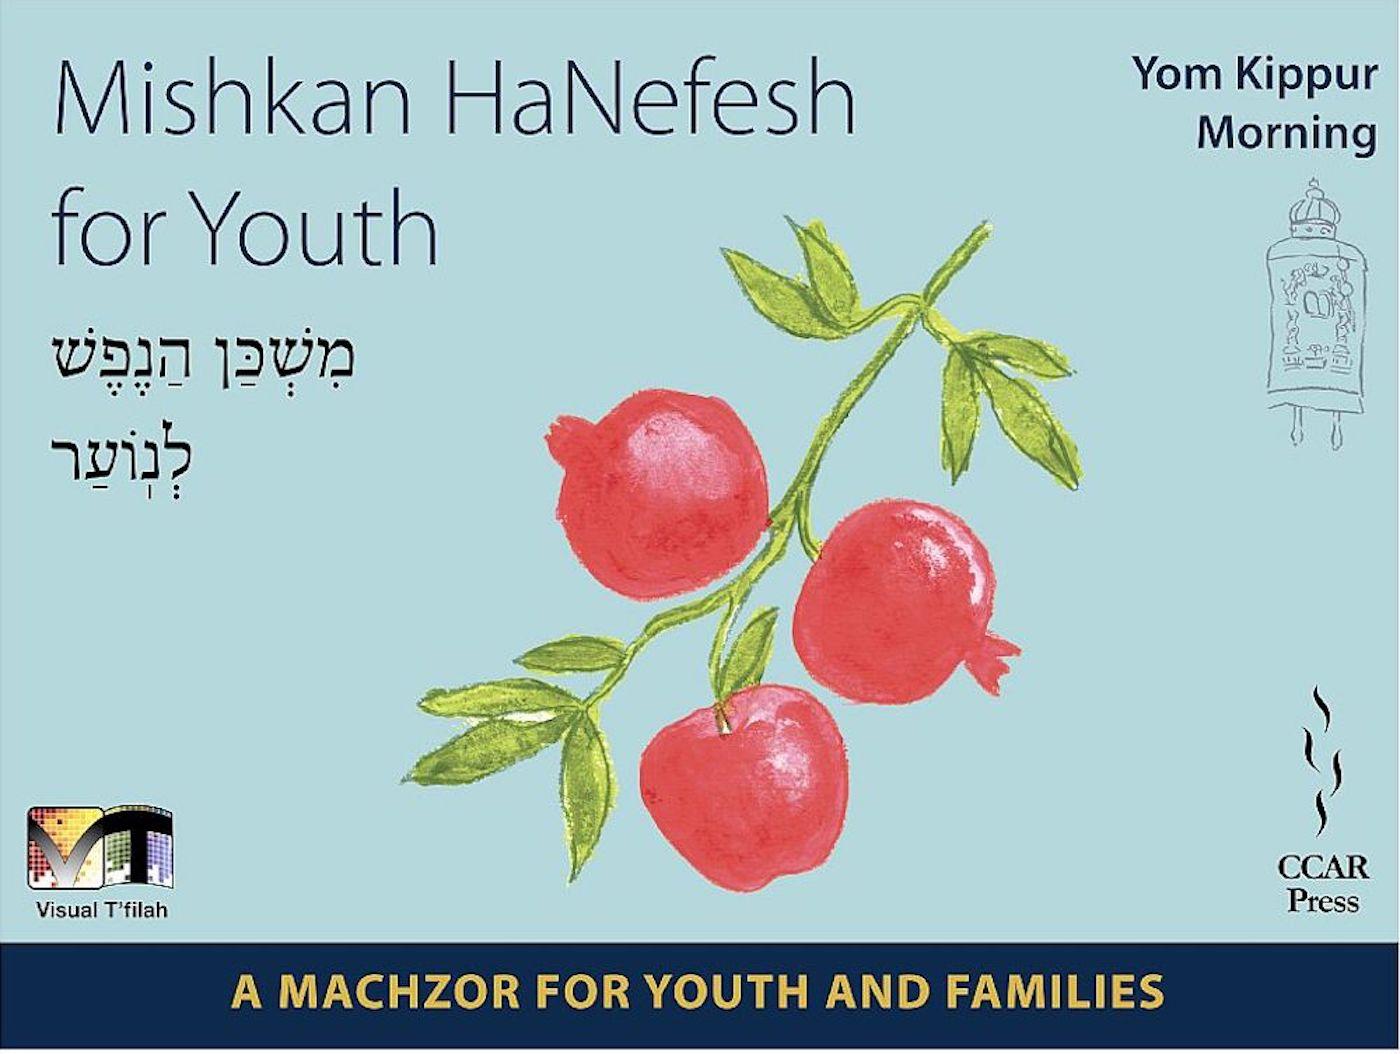 Mishkan HaNefesh for Youth Visual T'filah- Yom Kippur - Morning